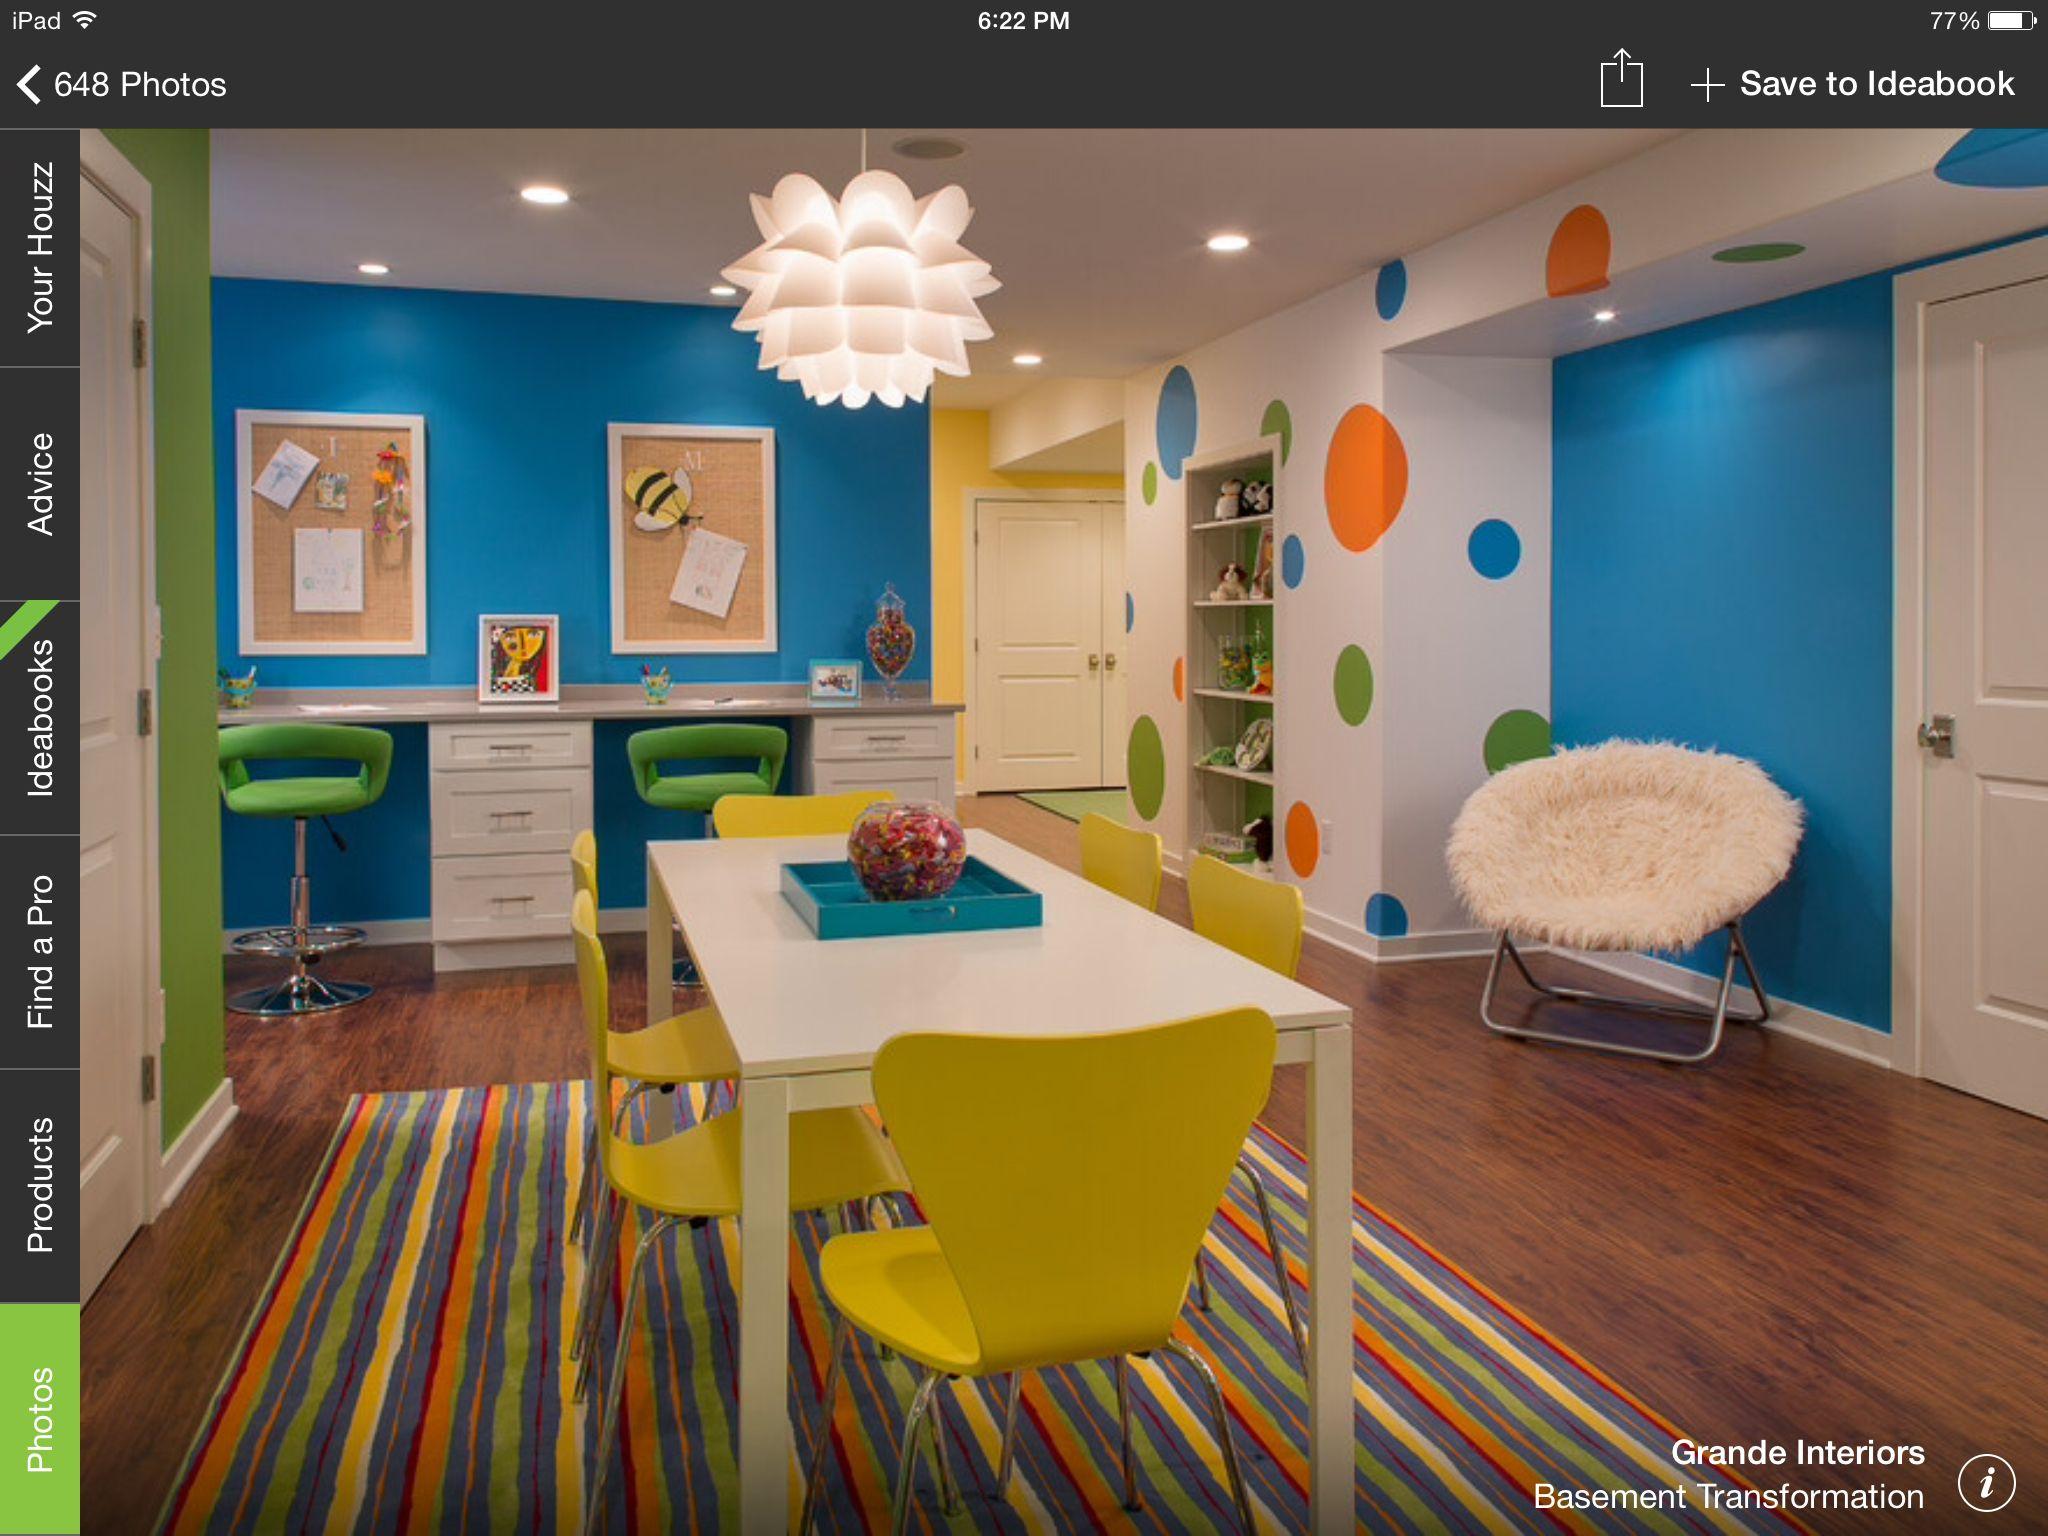 Best paint colors for preschool classrooms - 25 Best Ideas About Kids Church Rooms On Pinterest Kids Church Decor Kids Church And Youth Room Church